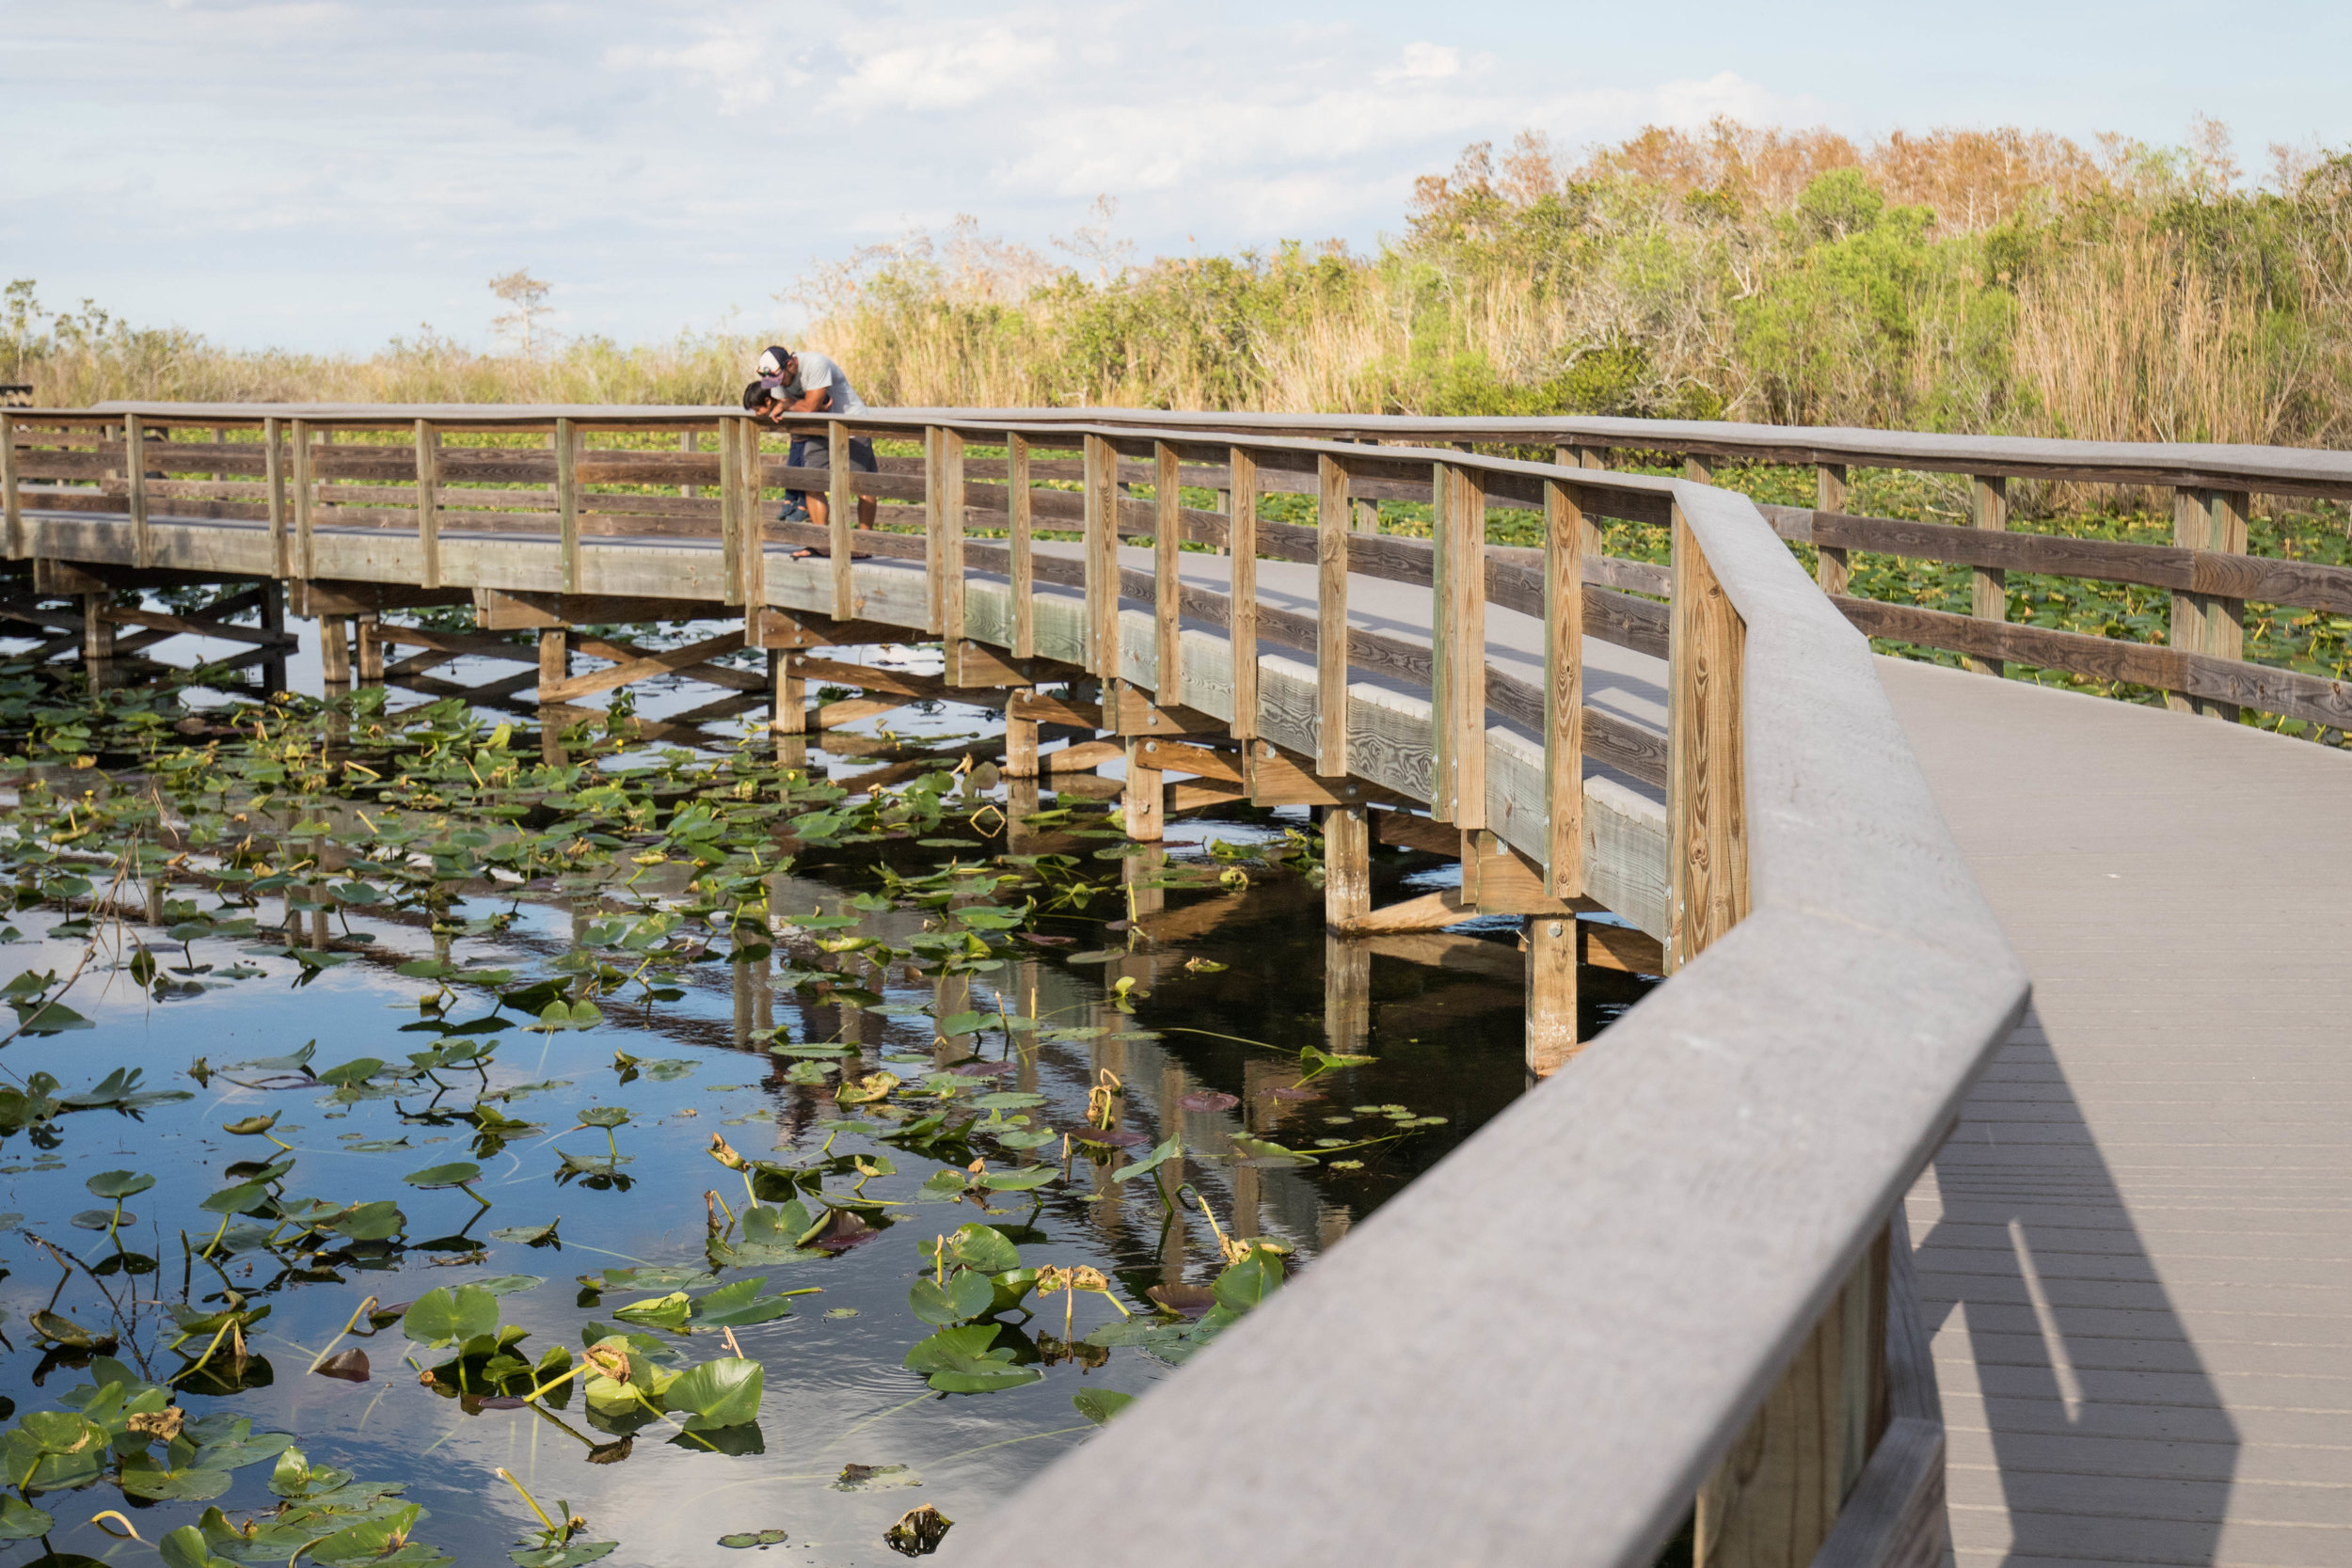 2019_Everglades-305.jpg